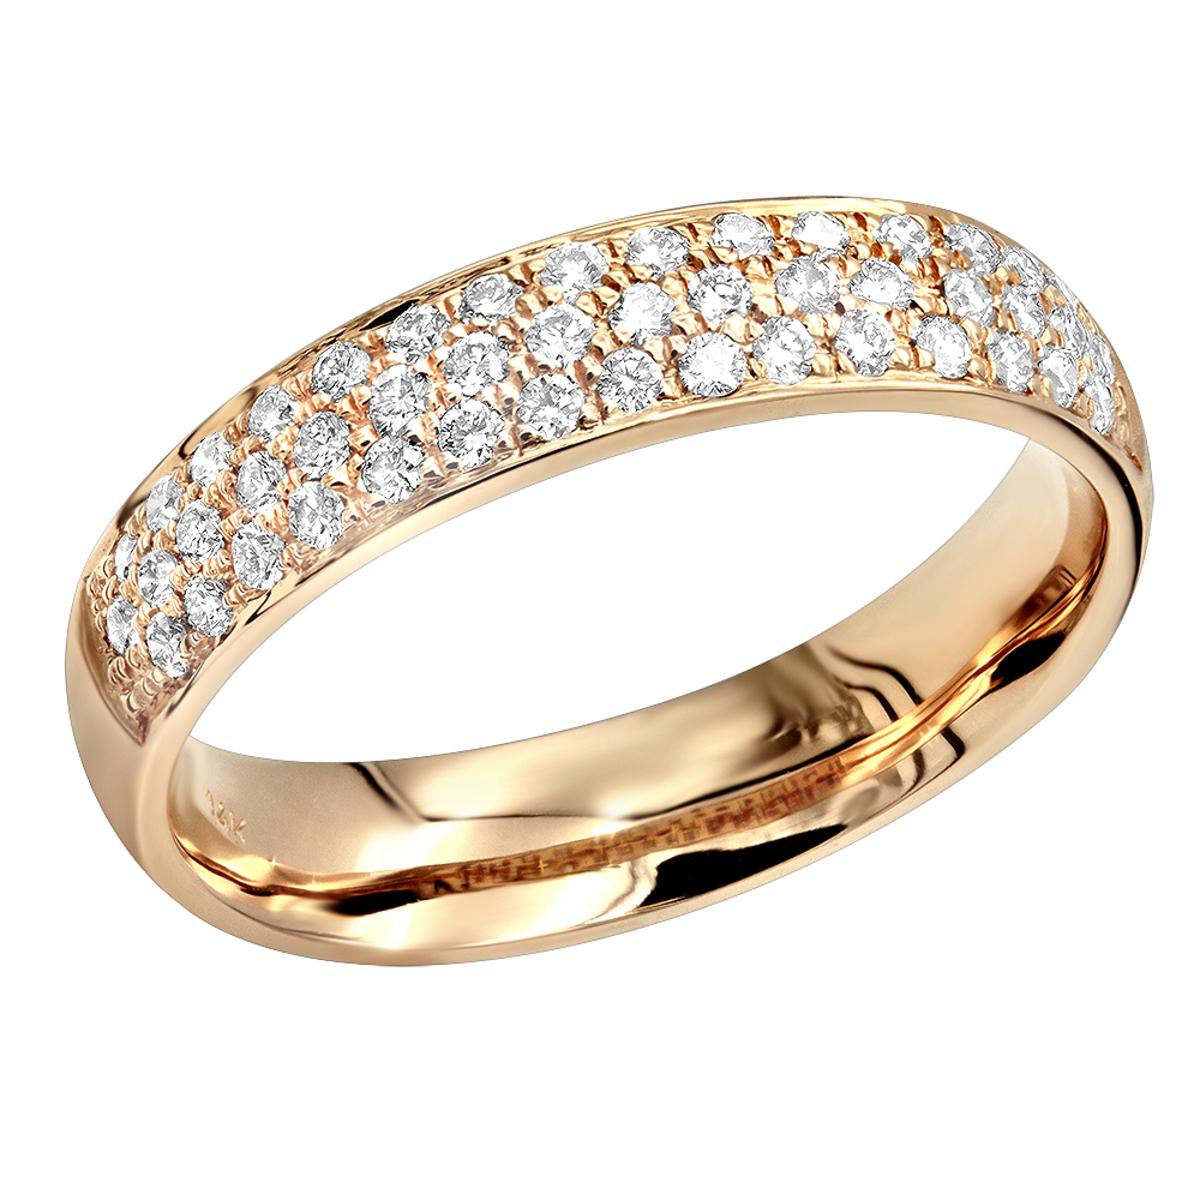 14k Gold Pave Diamond Wedding Band for Women Anniversary Ring Round Diamonds